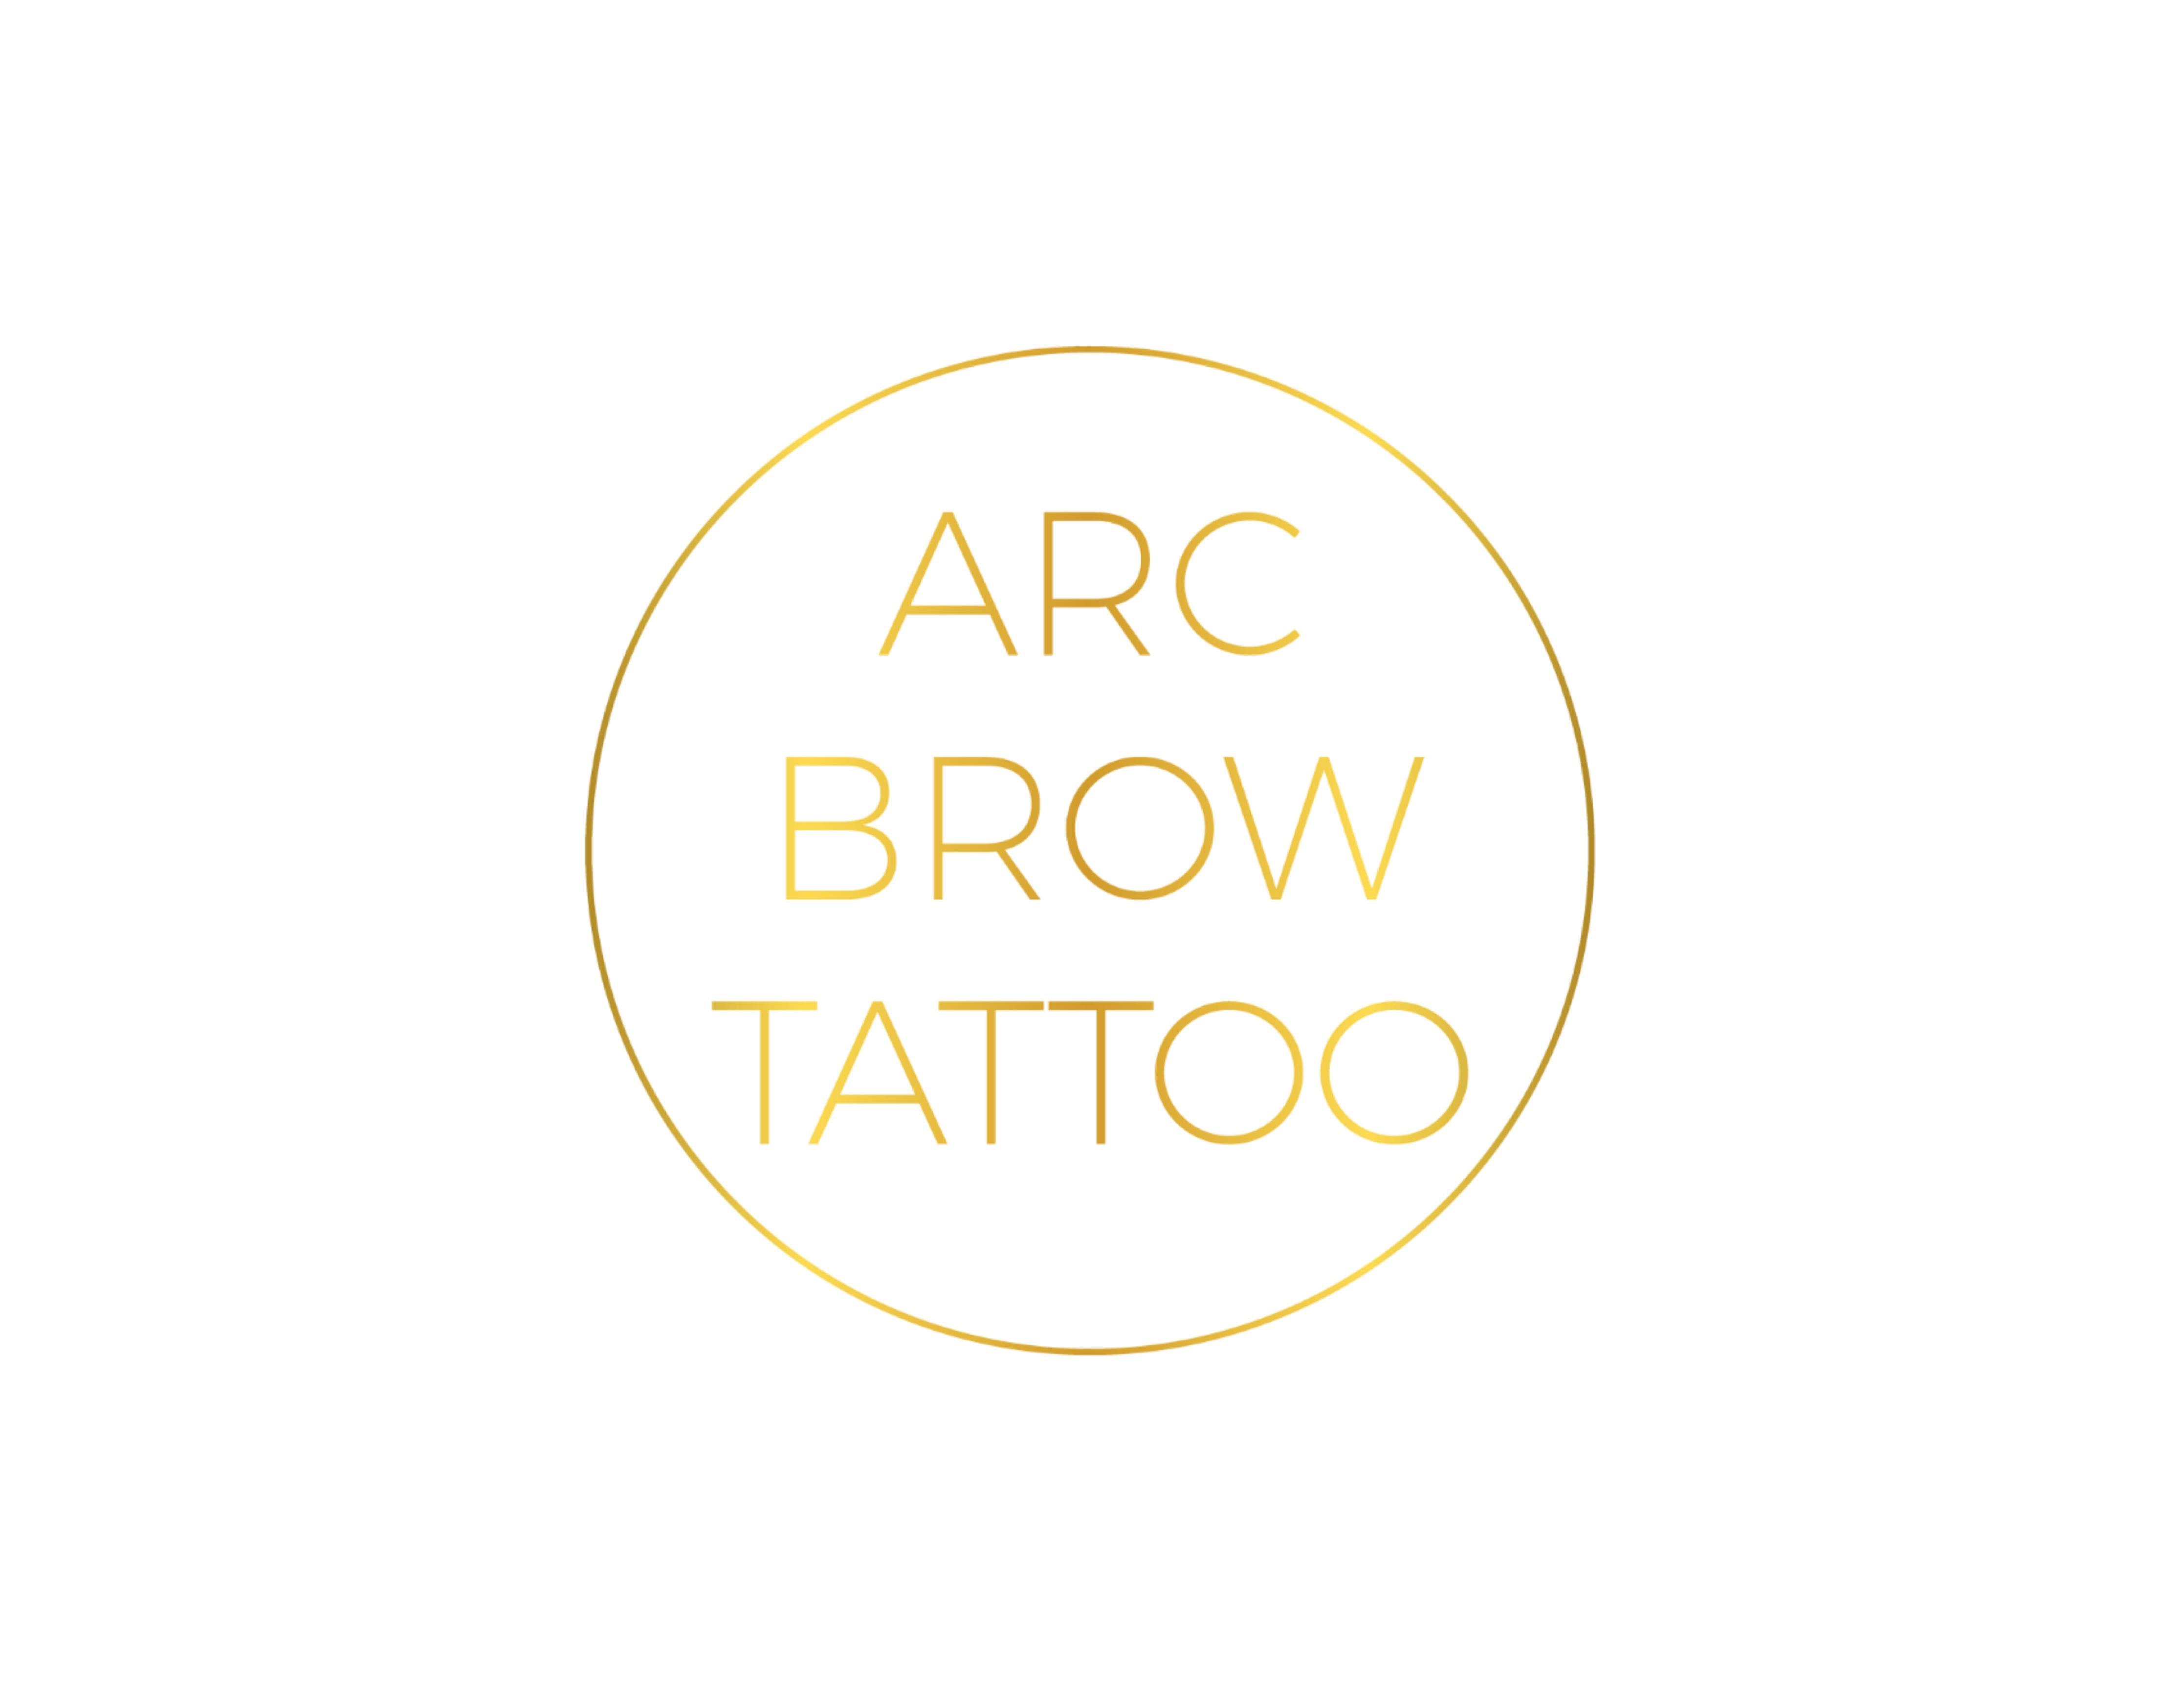 Arc Brow Tattoo